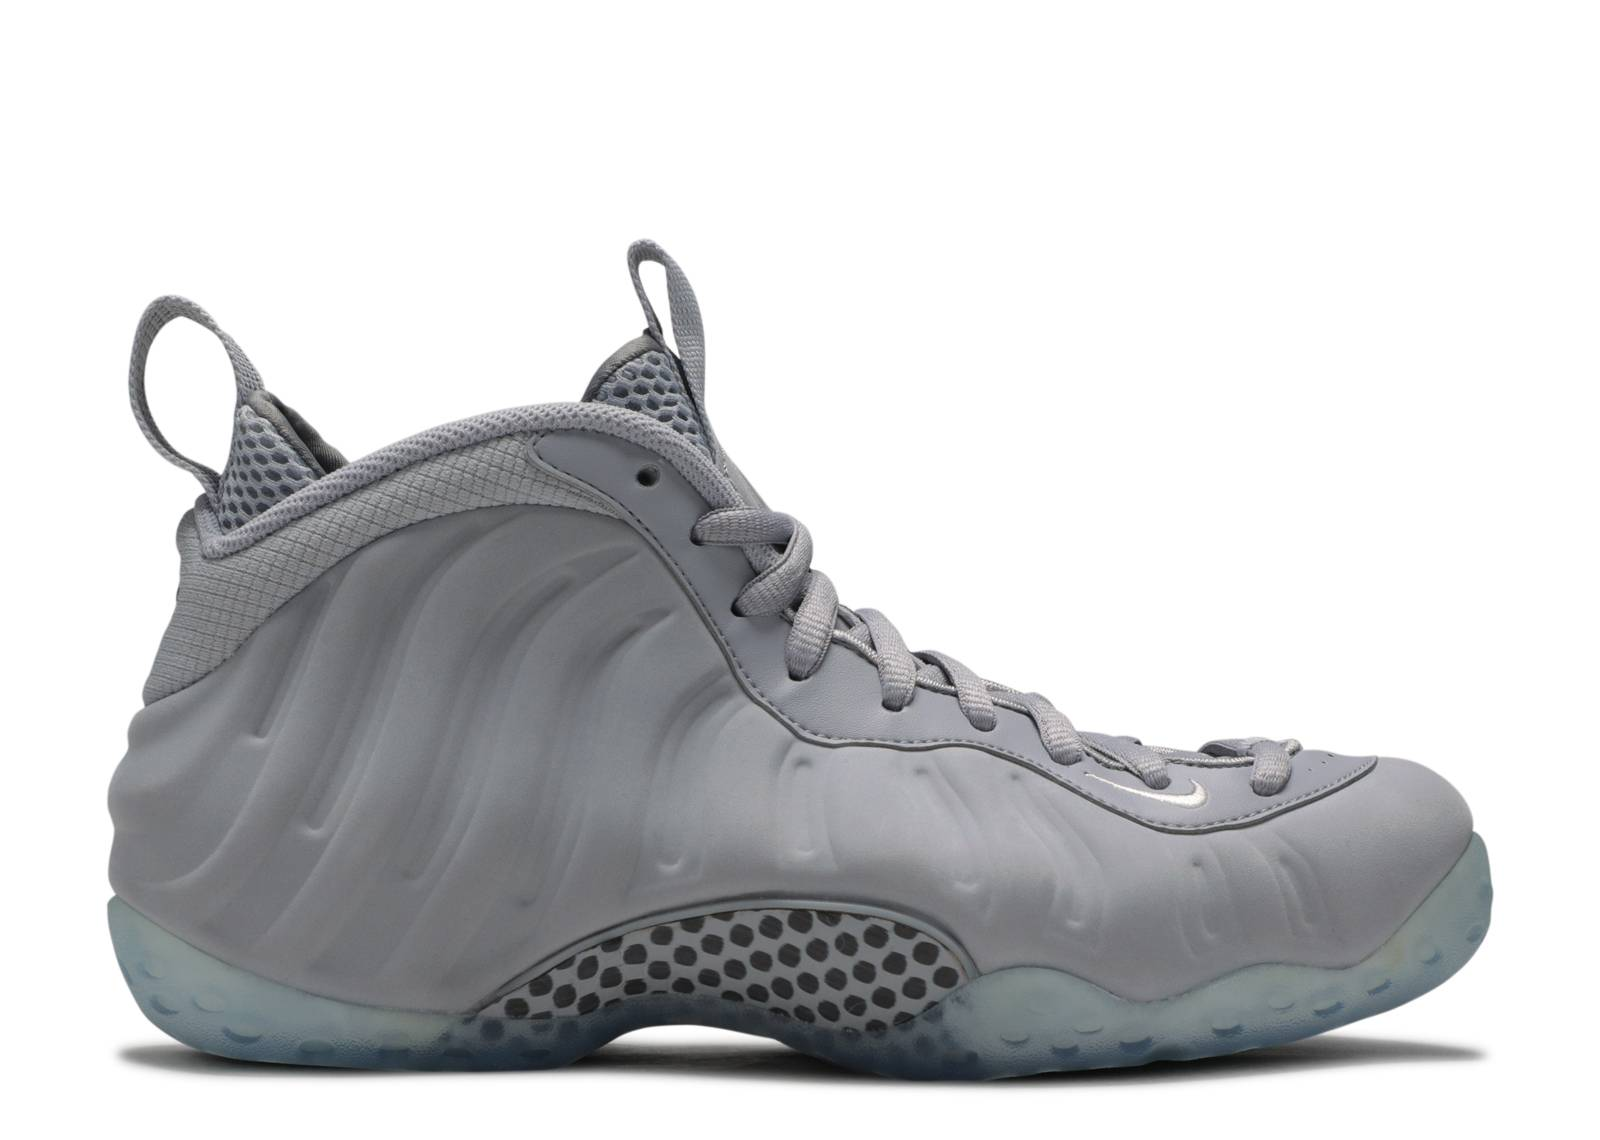 98b0dfc8e78 Air Foamposite One Prm - Nike - 575420 007 - wolf grey white-cool grey-blk